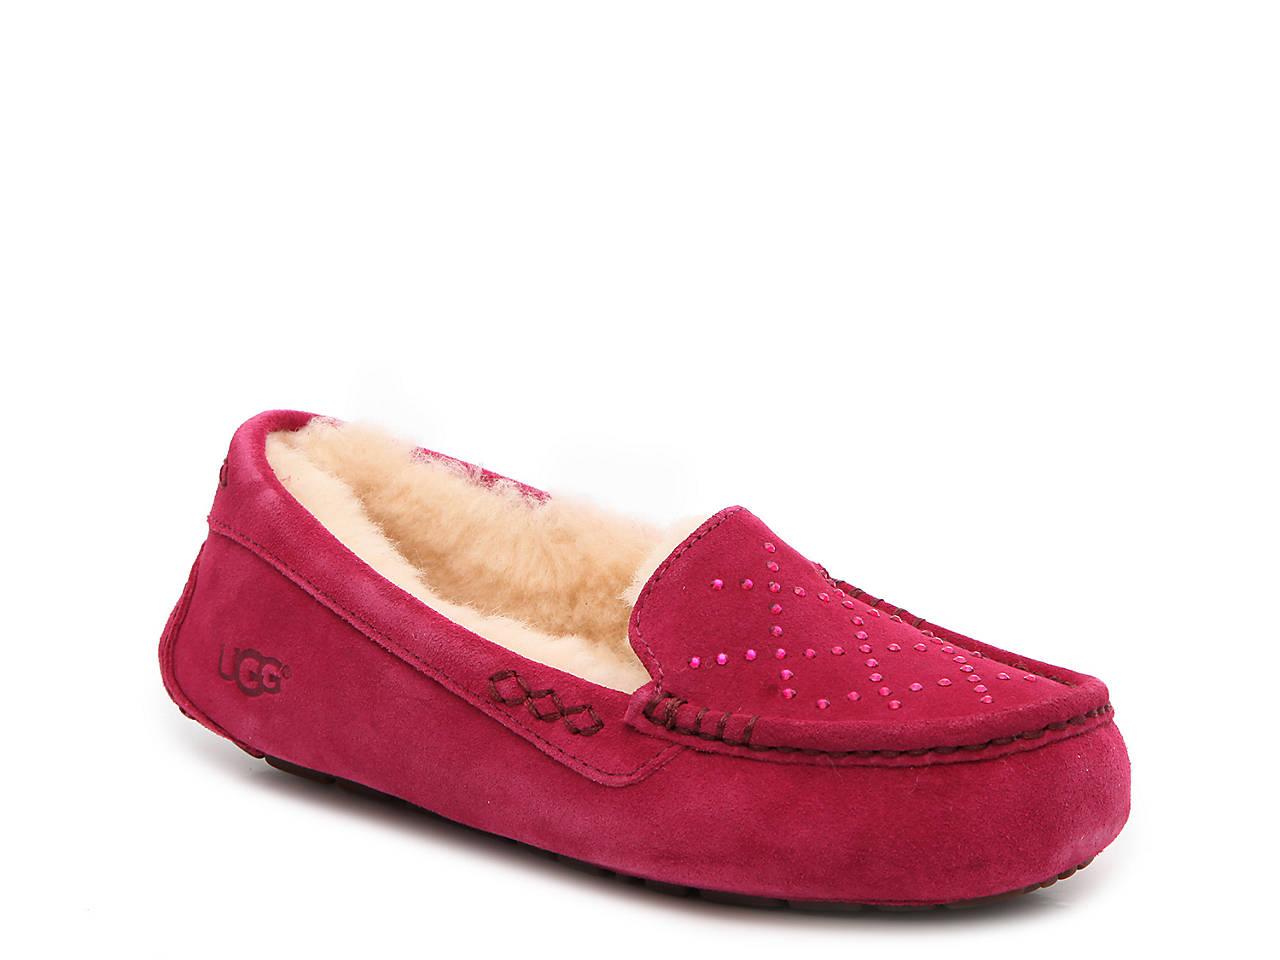 2228f0e8ef6 UGG Australia Ansley Slipper Women s Shoes